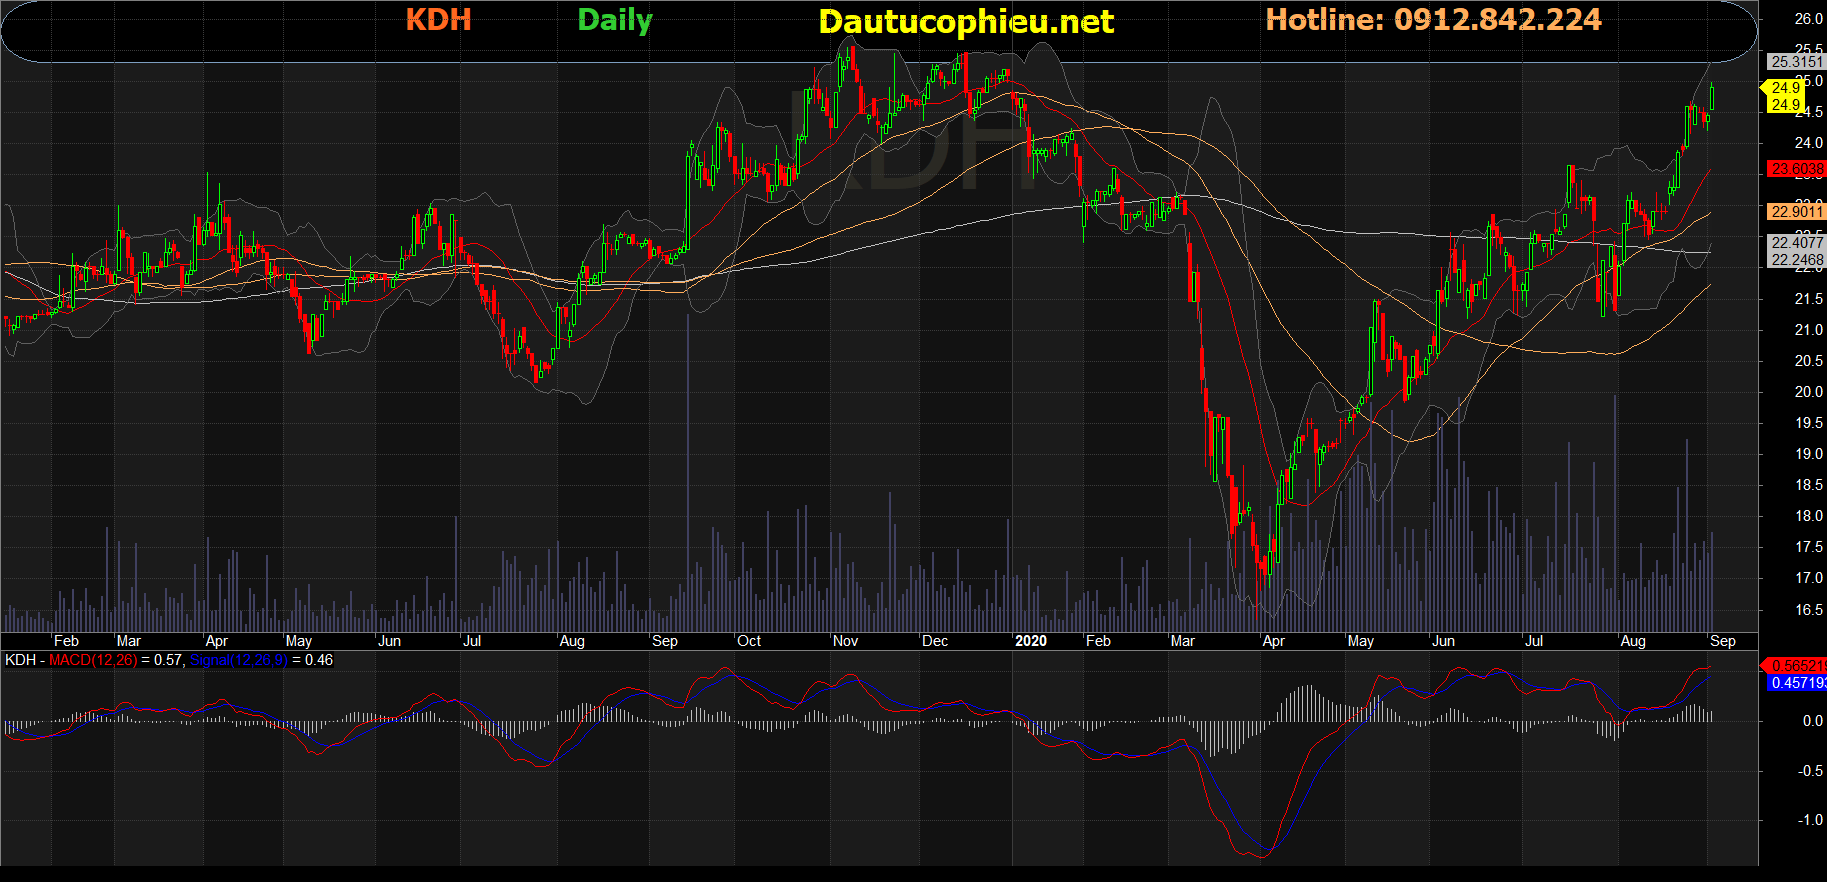 Cổ phiếu KDH